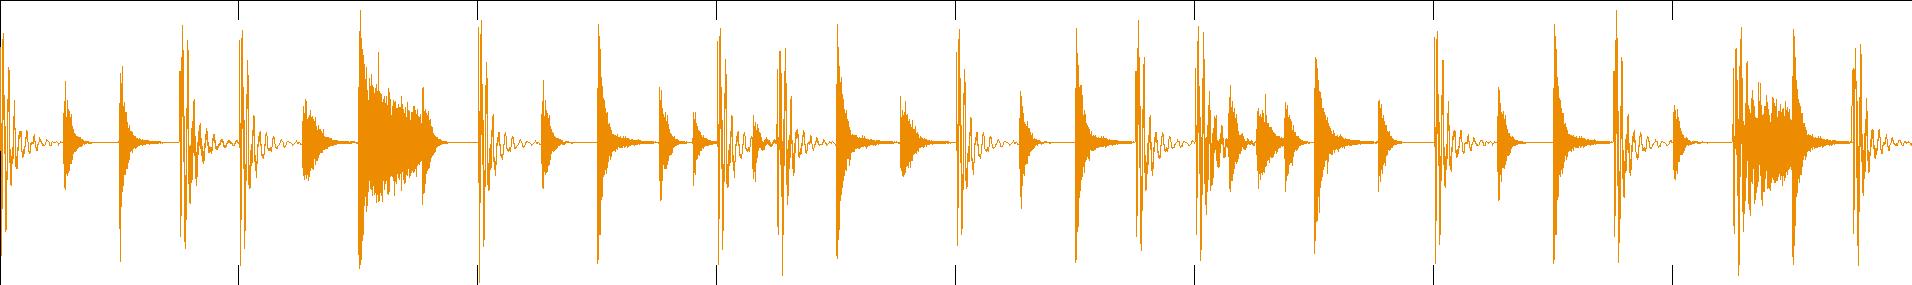 WaveDrum02_55_MIX